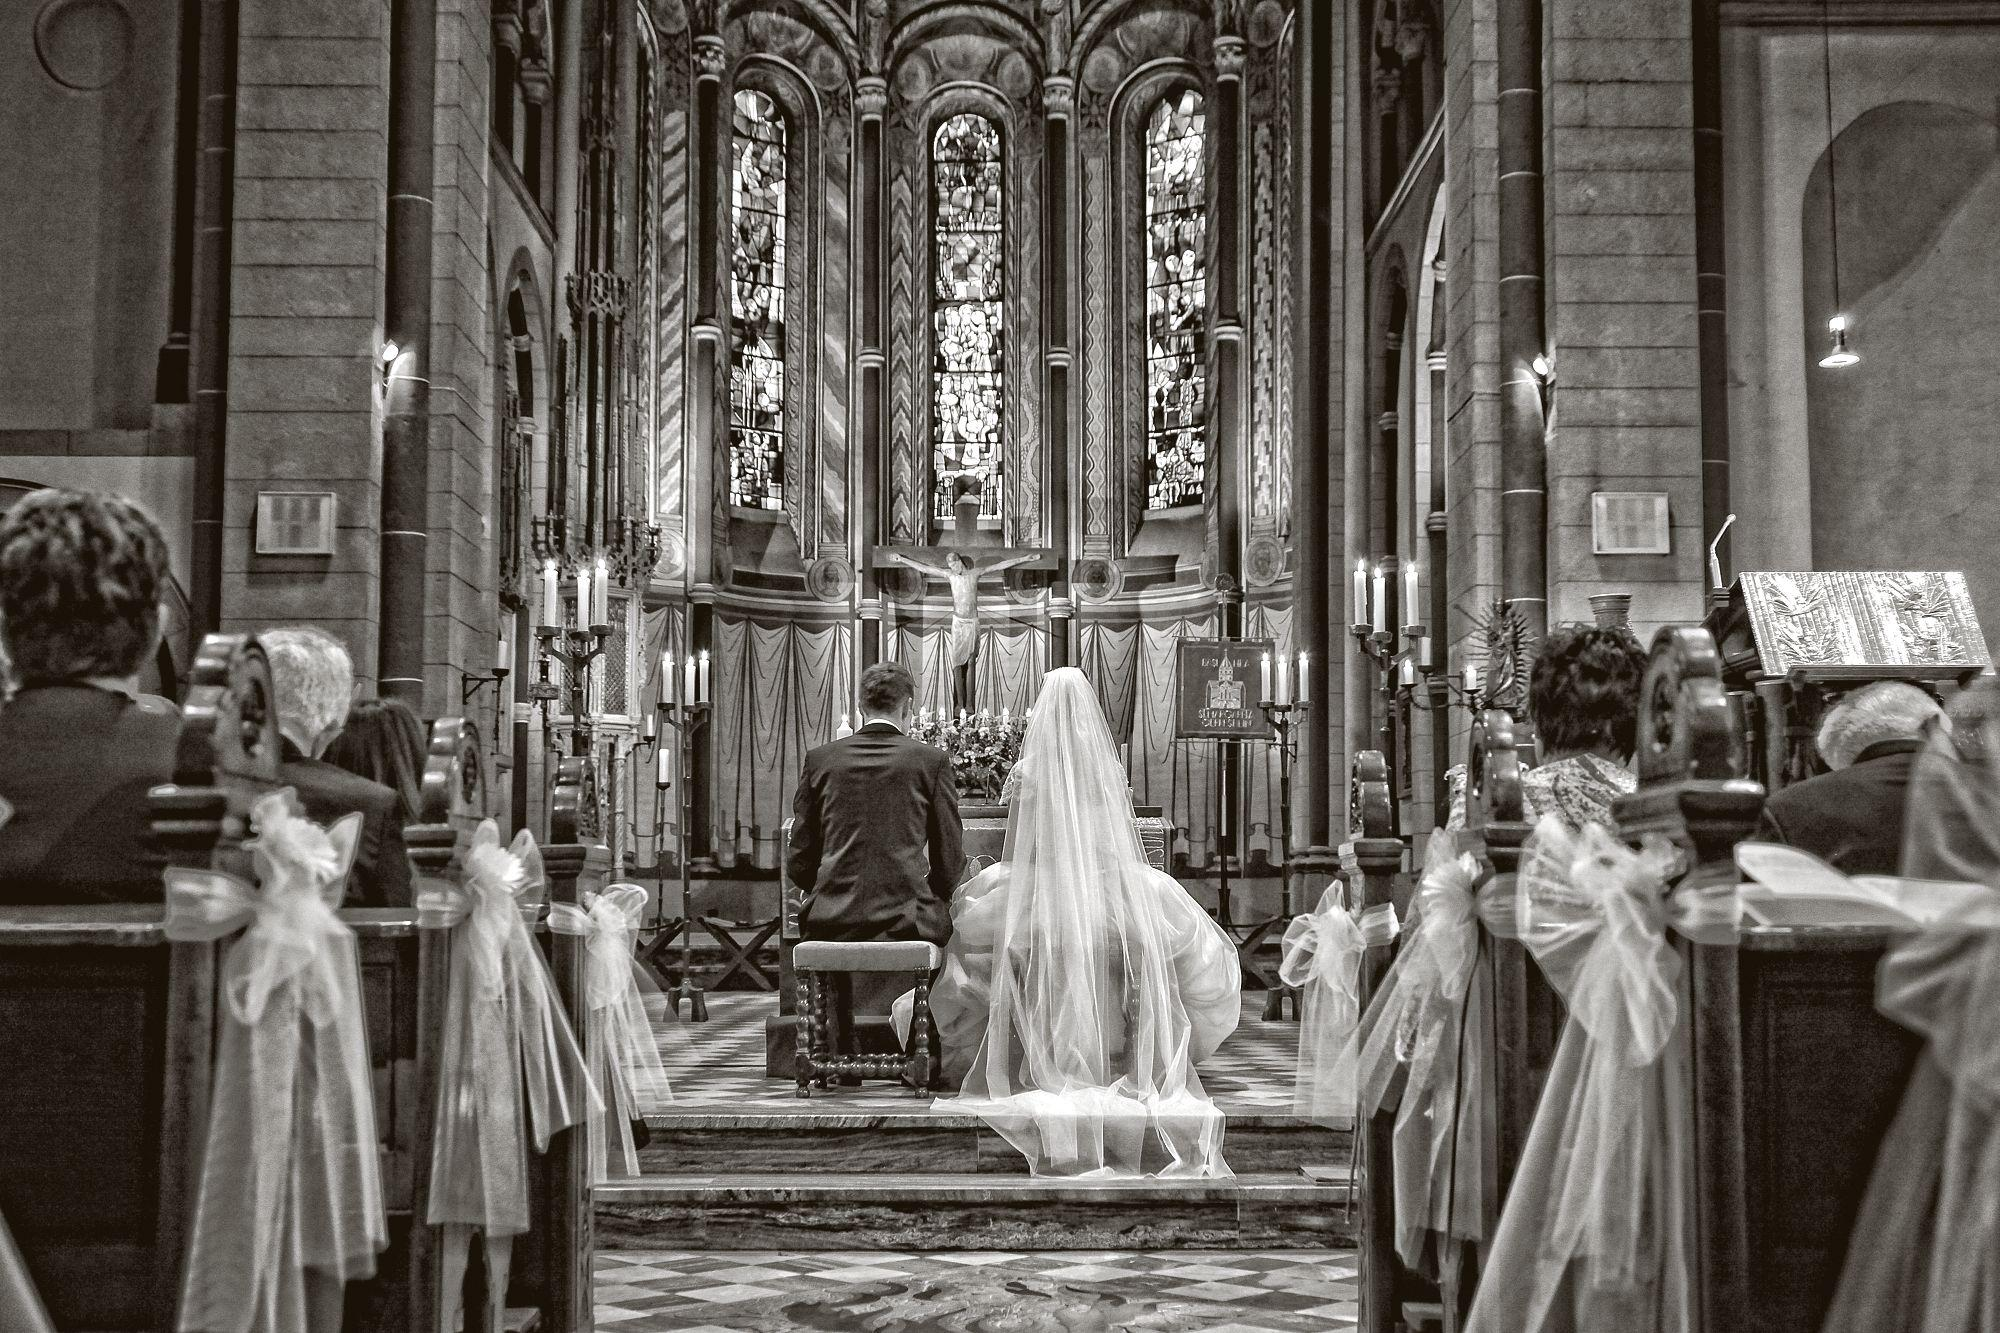 A beautiful raining wedding day